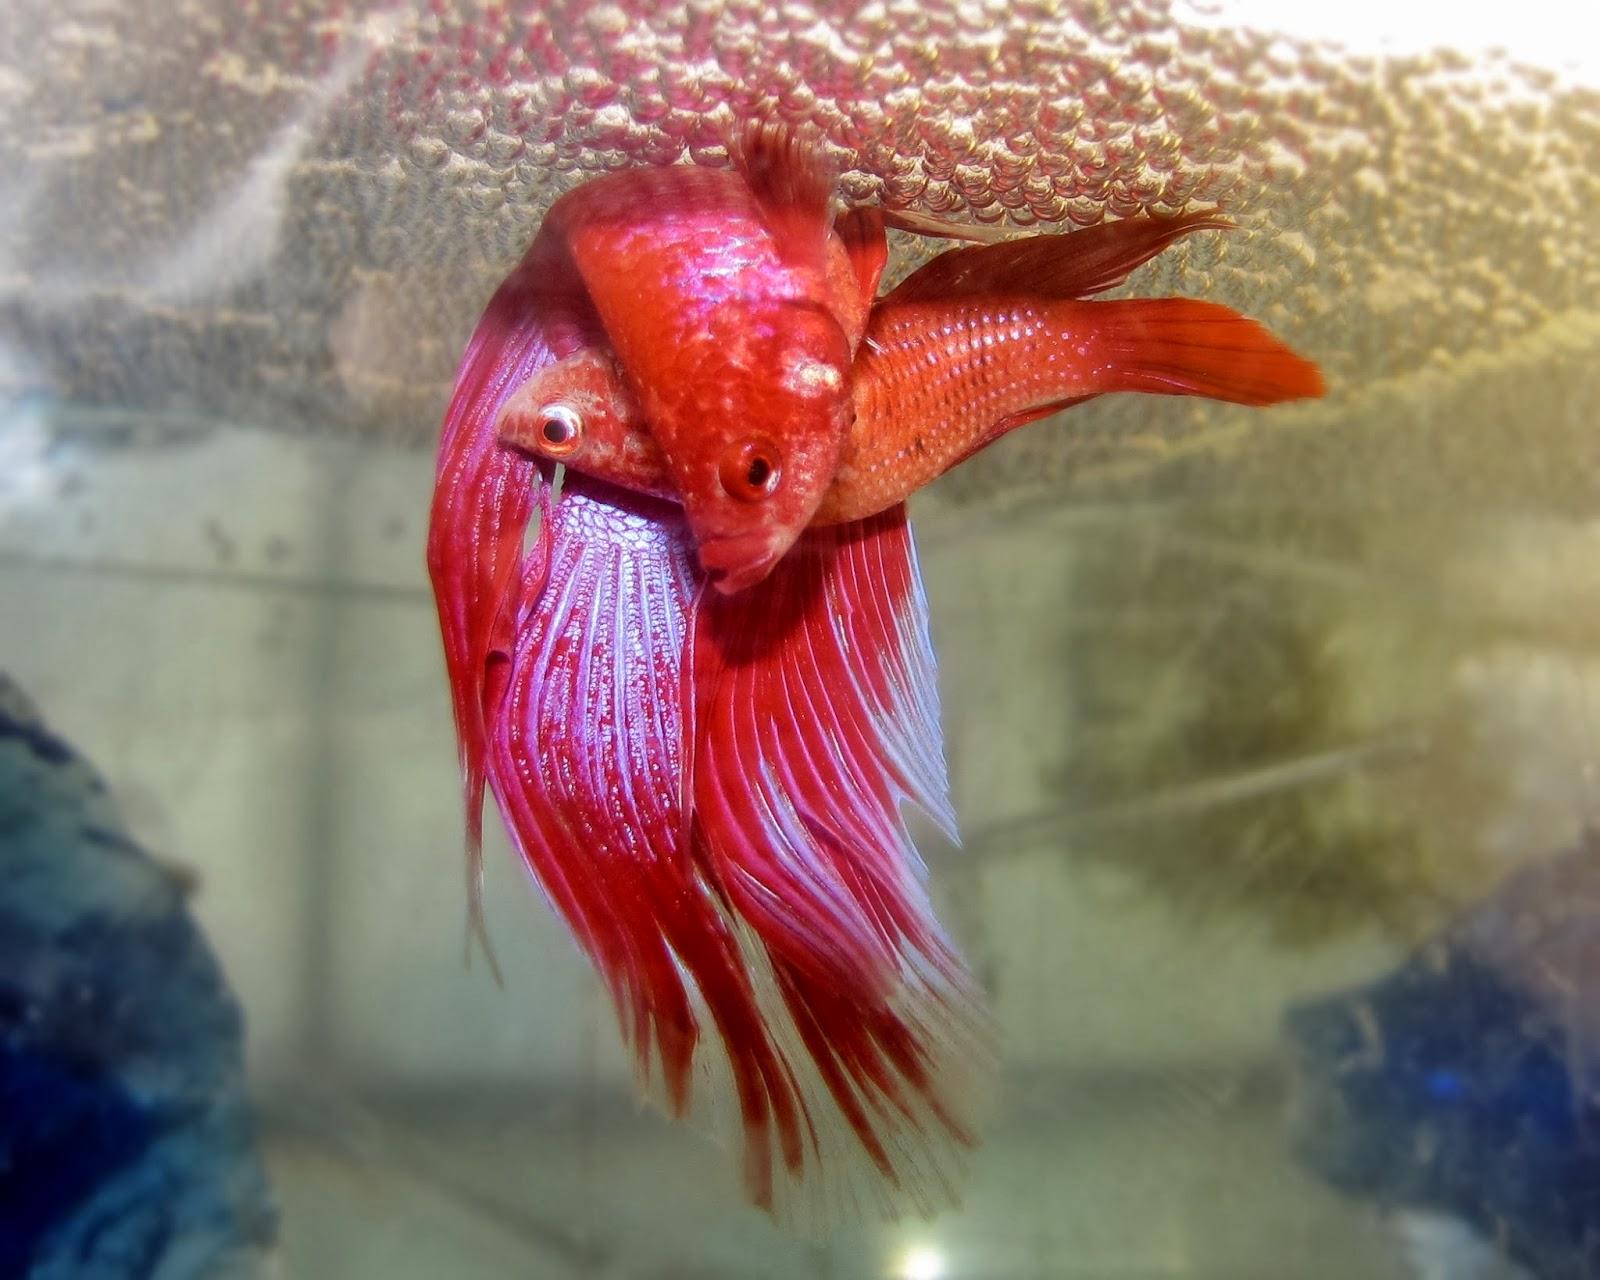 Daniel (Ibbe);: Betta: The Siamese Fighting Fish